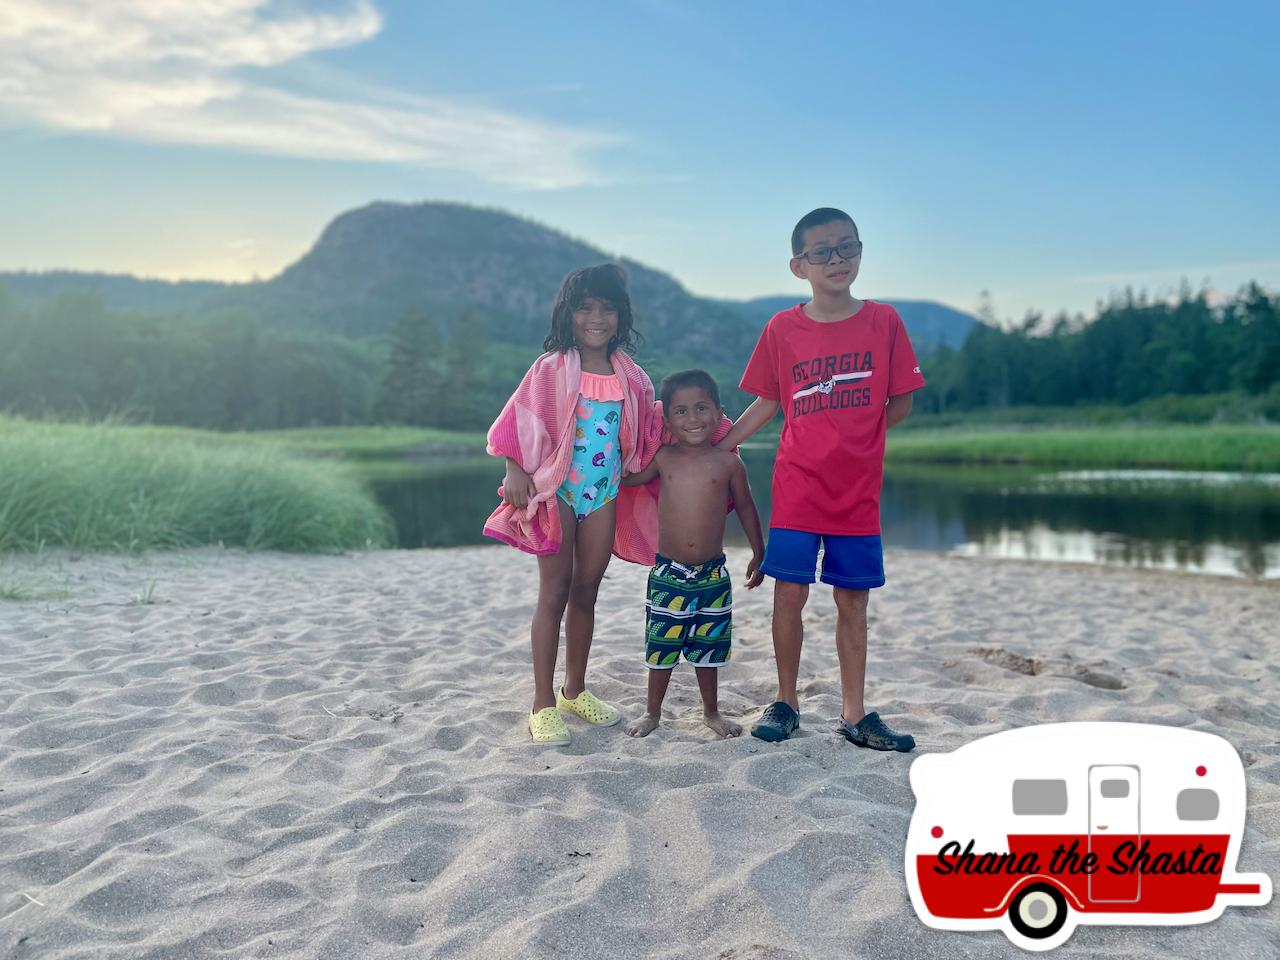 Beehive-from-Sand-Beach-Acadia